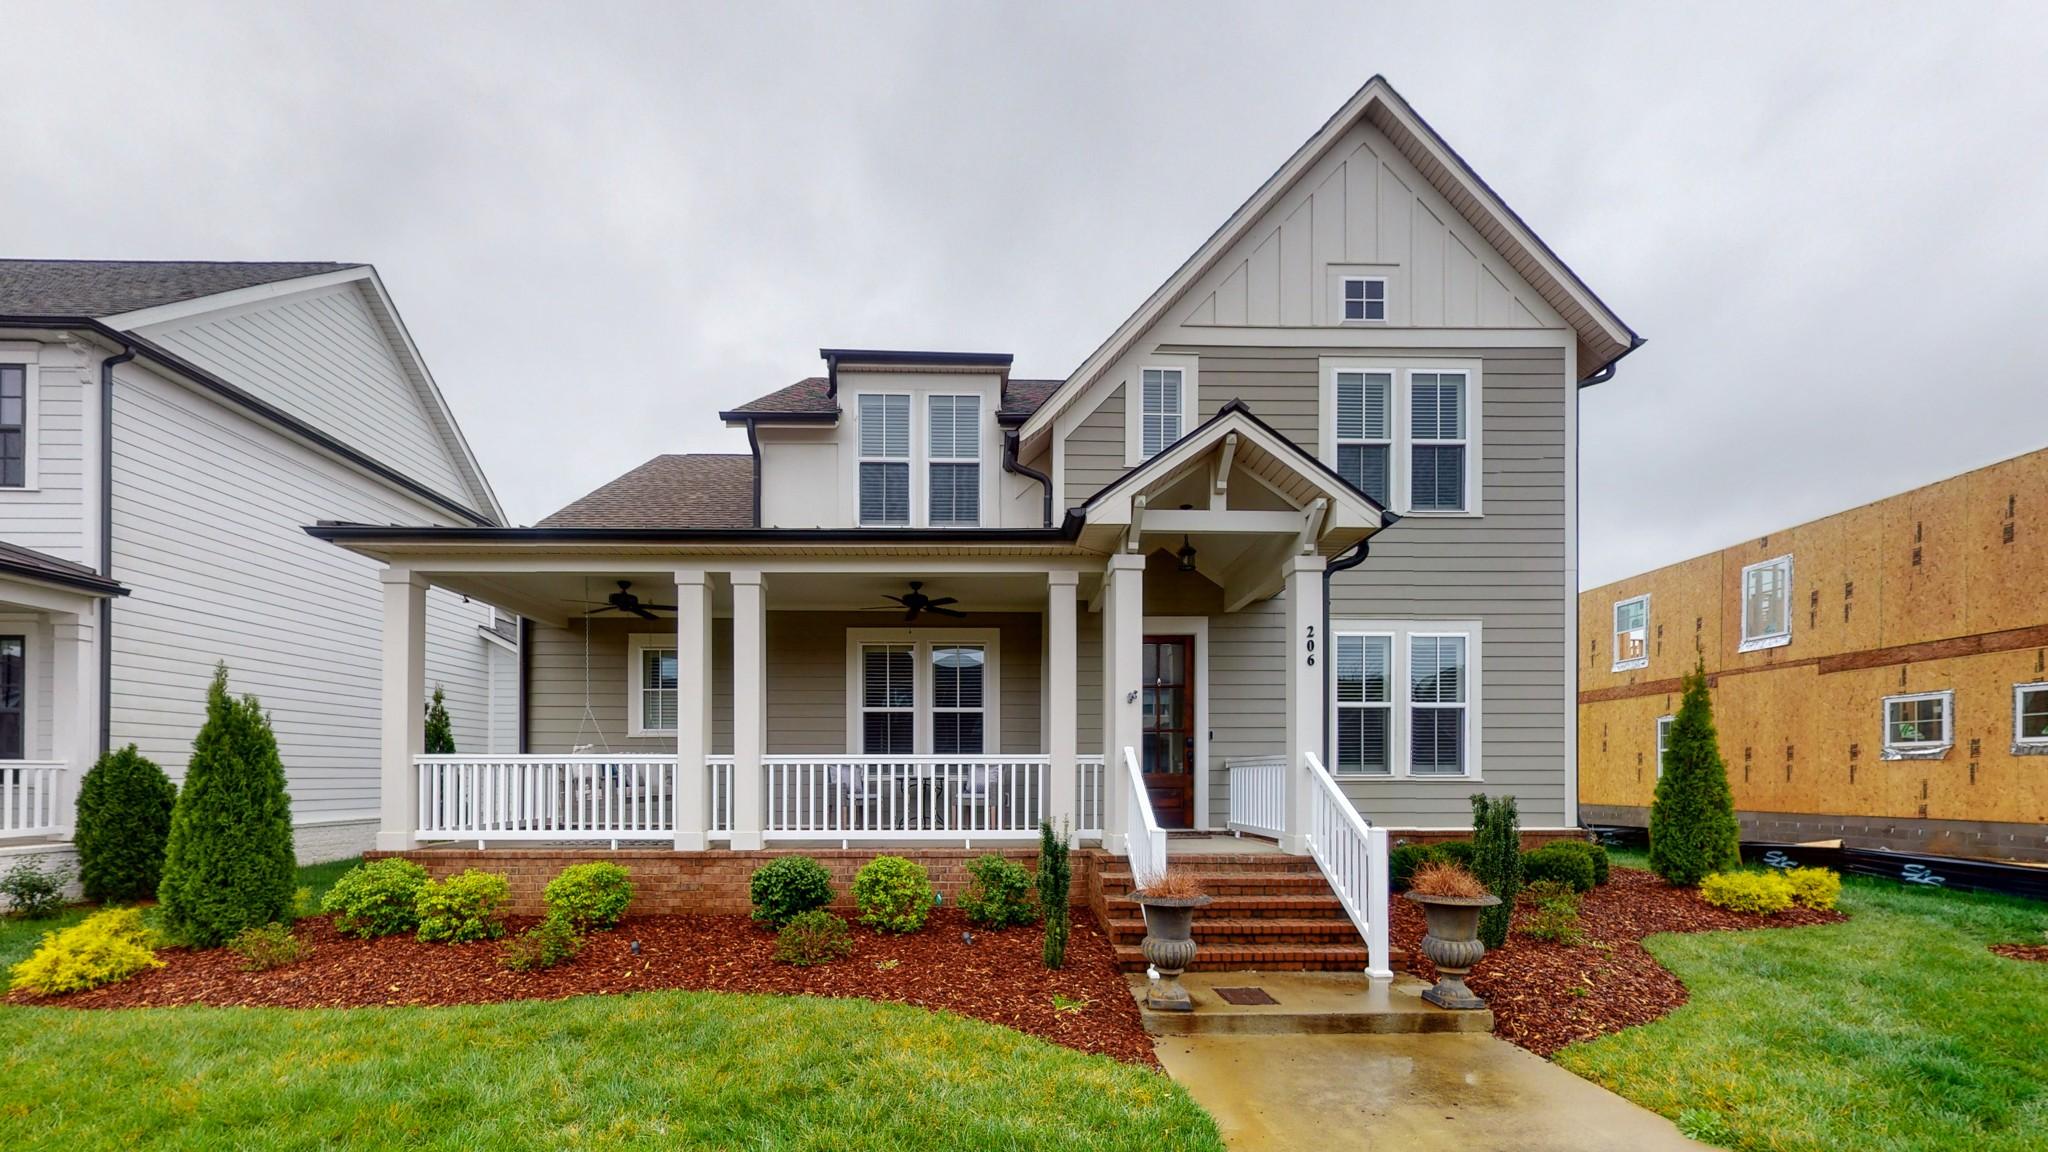 206 Ashington Cir Property Photo - Hendersonville, TN real estate listing